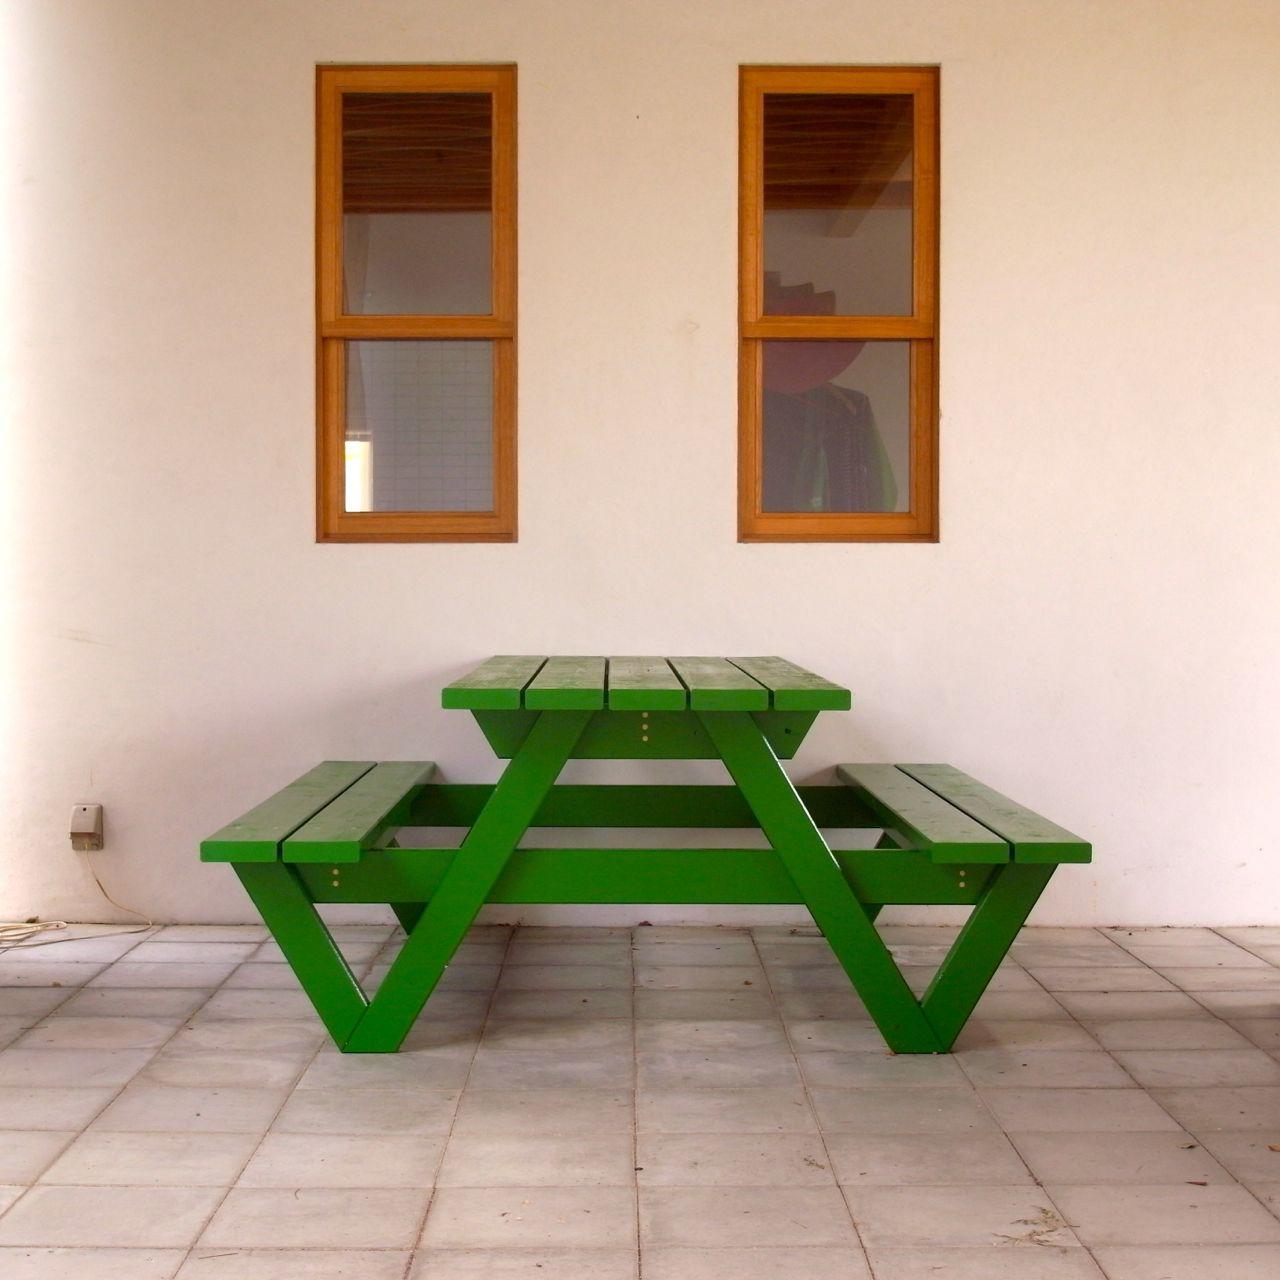 W:1600 mm(片側に3人が座れます。)  D: 1670 mm(写真の方向)  H:   700 mm SH: 420 mm